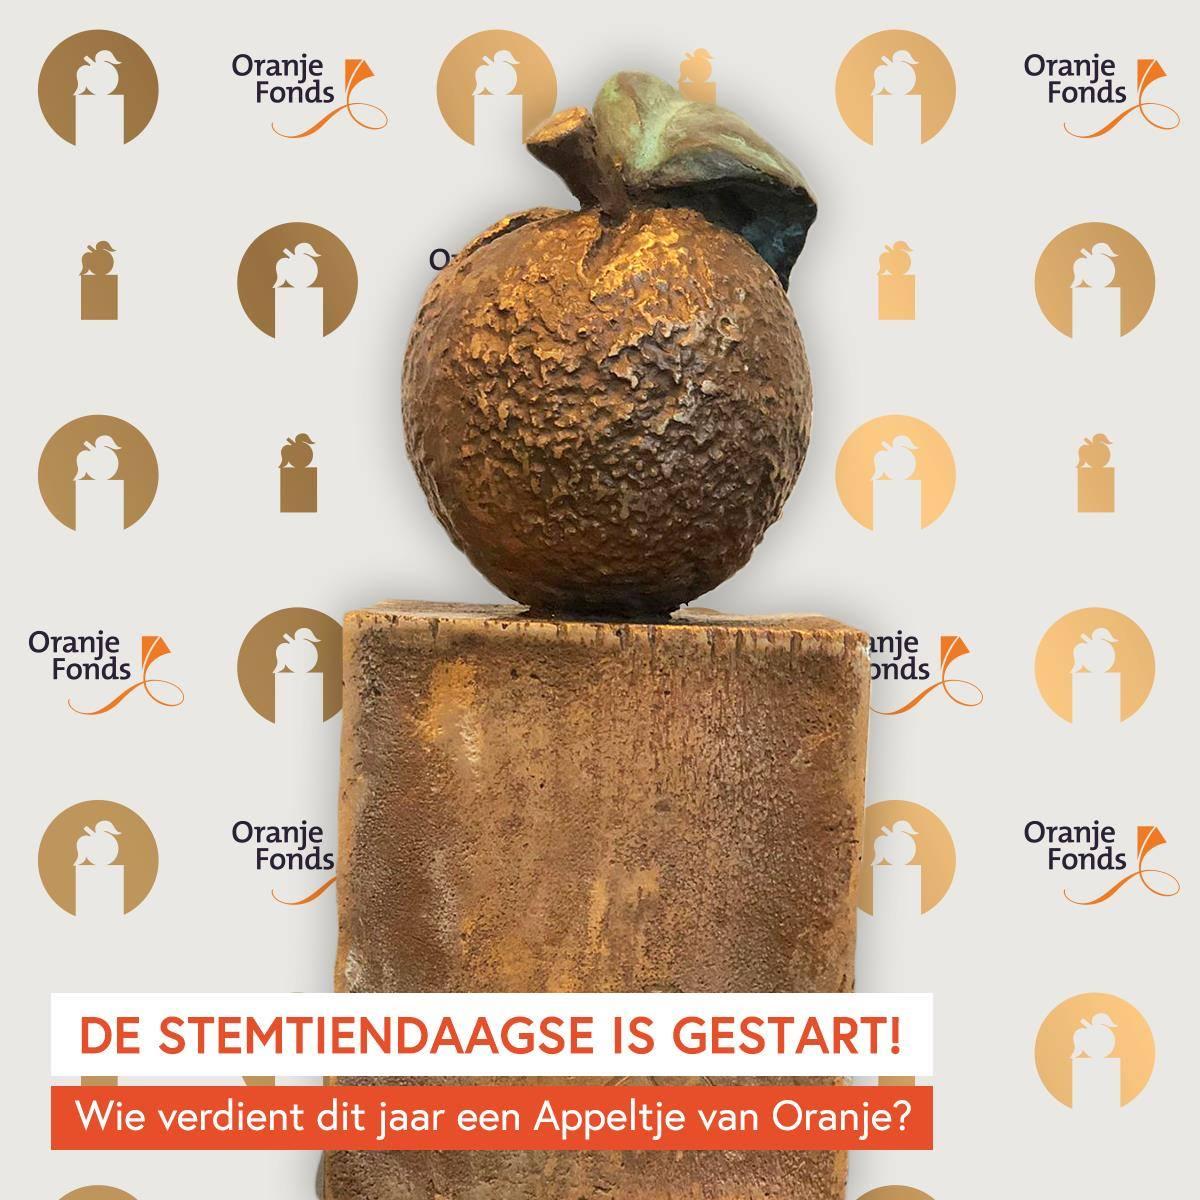 Stemtiendaagse Appeltjes van Oranje